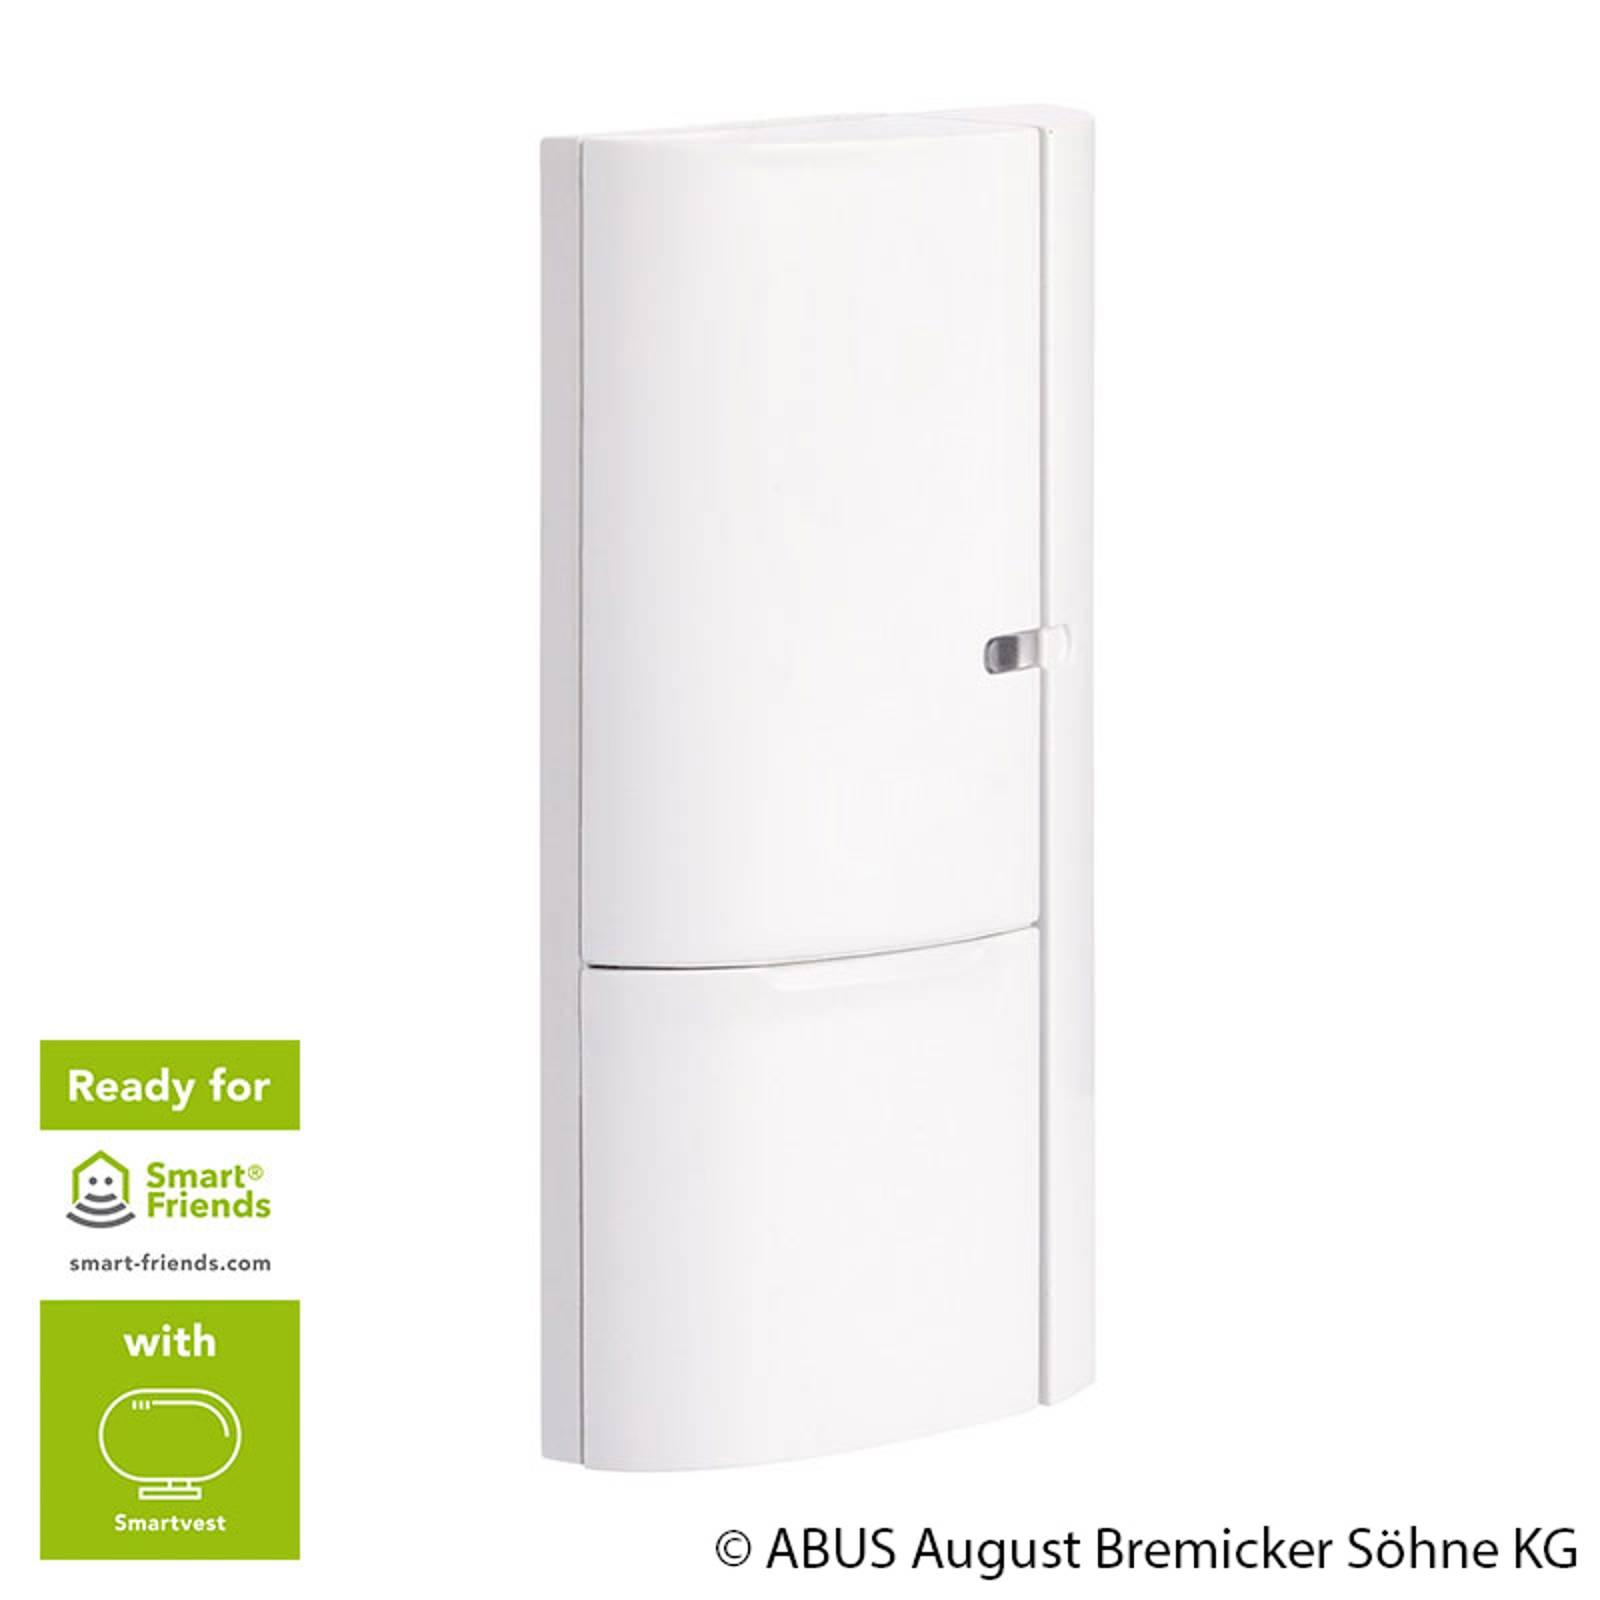 ABUS Smartvest trådlös öppningssensor dörr fönster